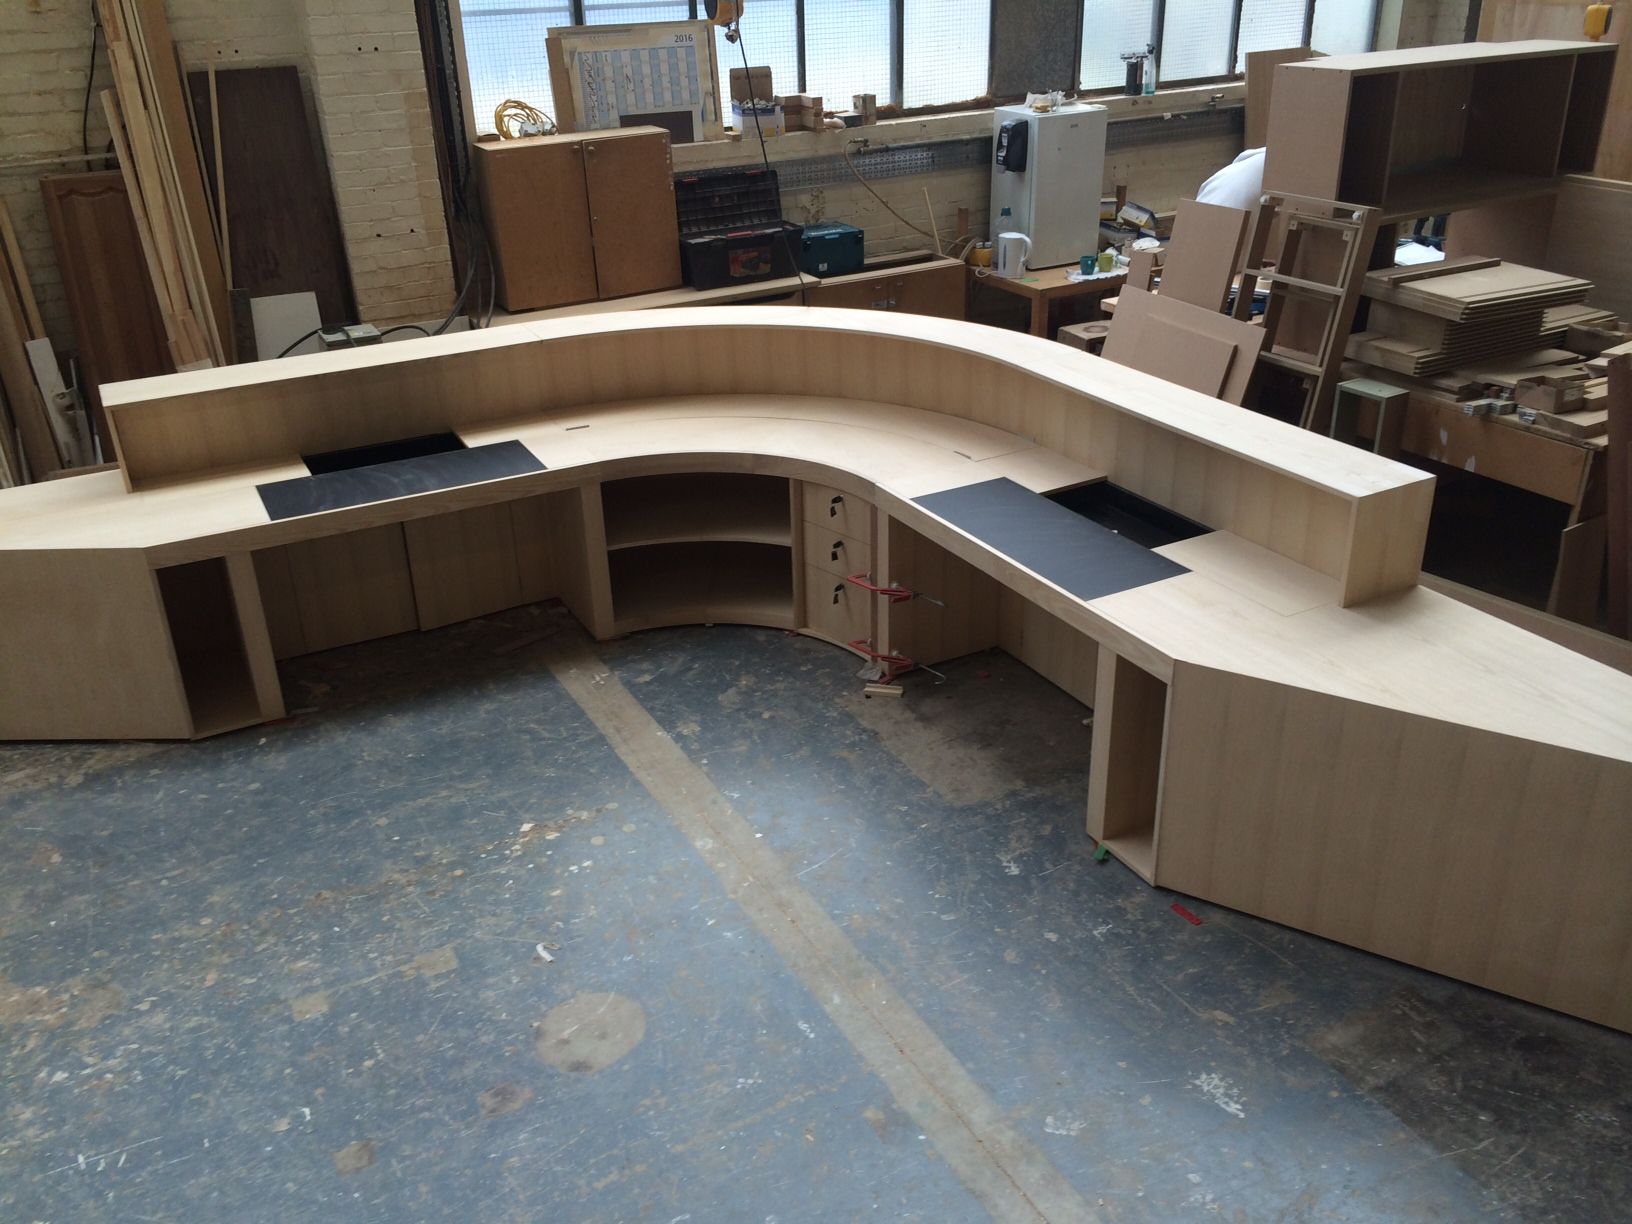 Kandd reception desk cabinetry